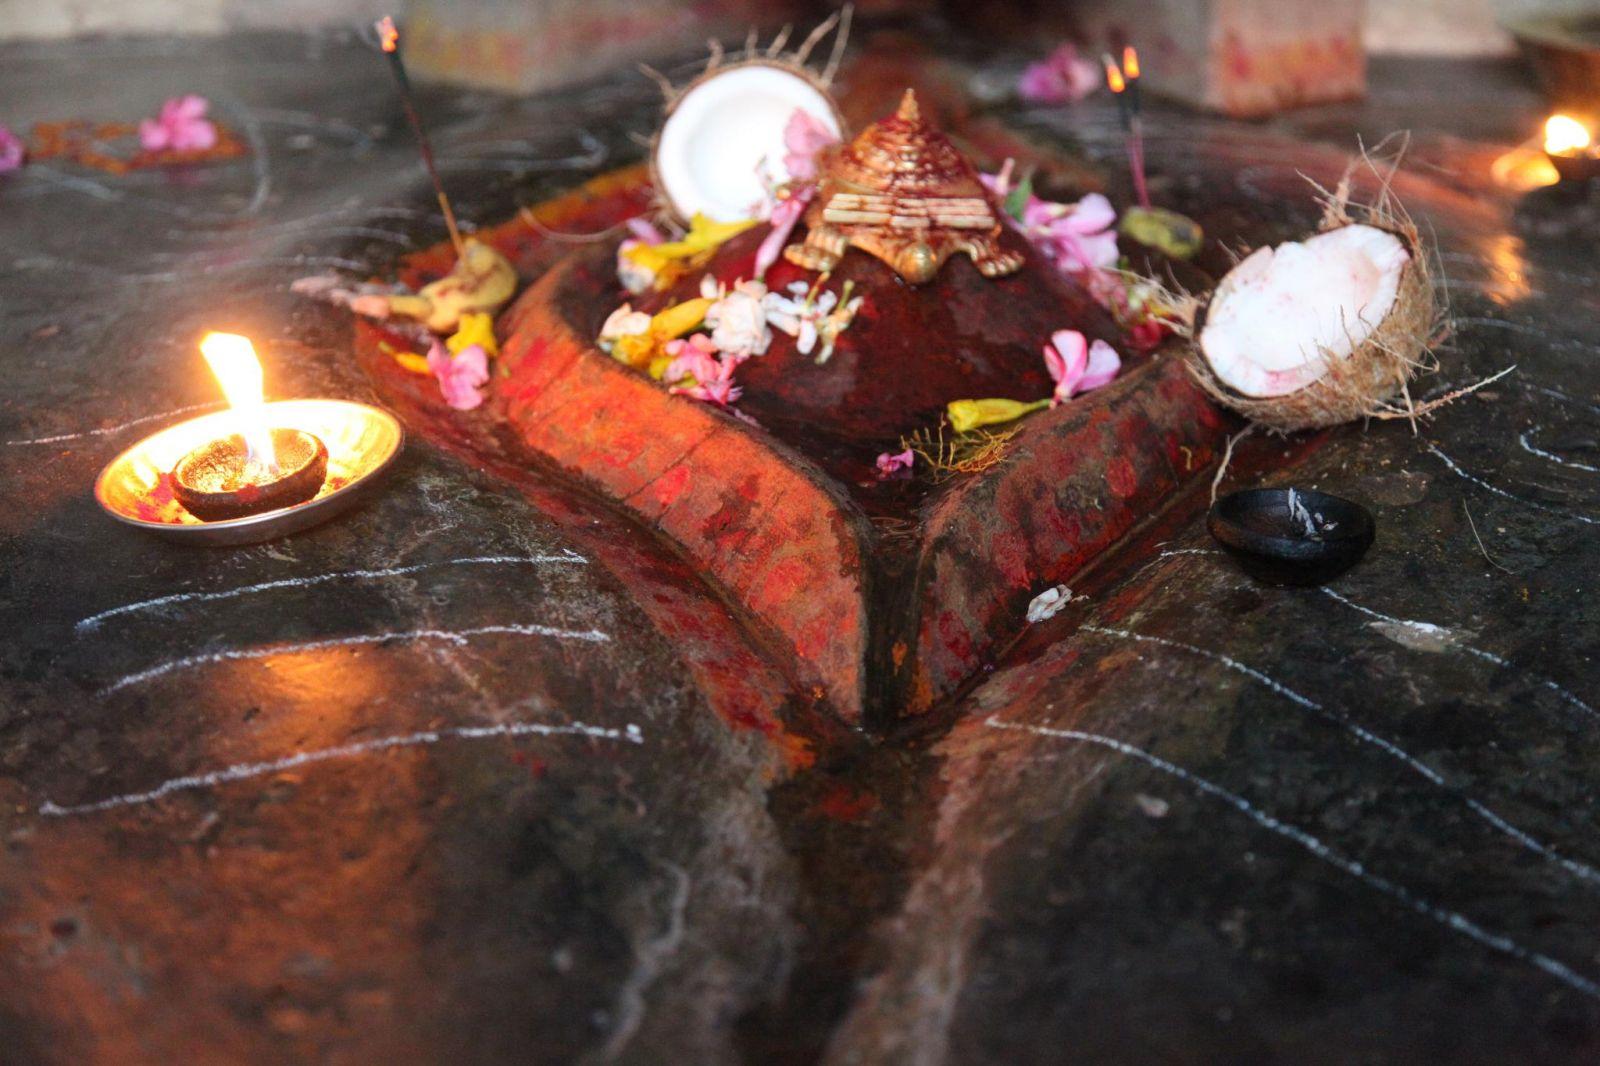 kamakhya temple history in hindi, kamakhya temple video, mystery, kamakhya temple menstruating goddess, kamakhya temple timings, how to reach kamakhya temple, india, weird, history, mythology, secrets of india, kamakhya, goddess of desire, bleeding devi, temple, hindu gods, hinduism